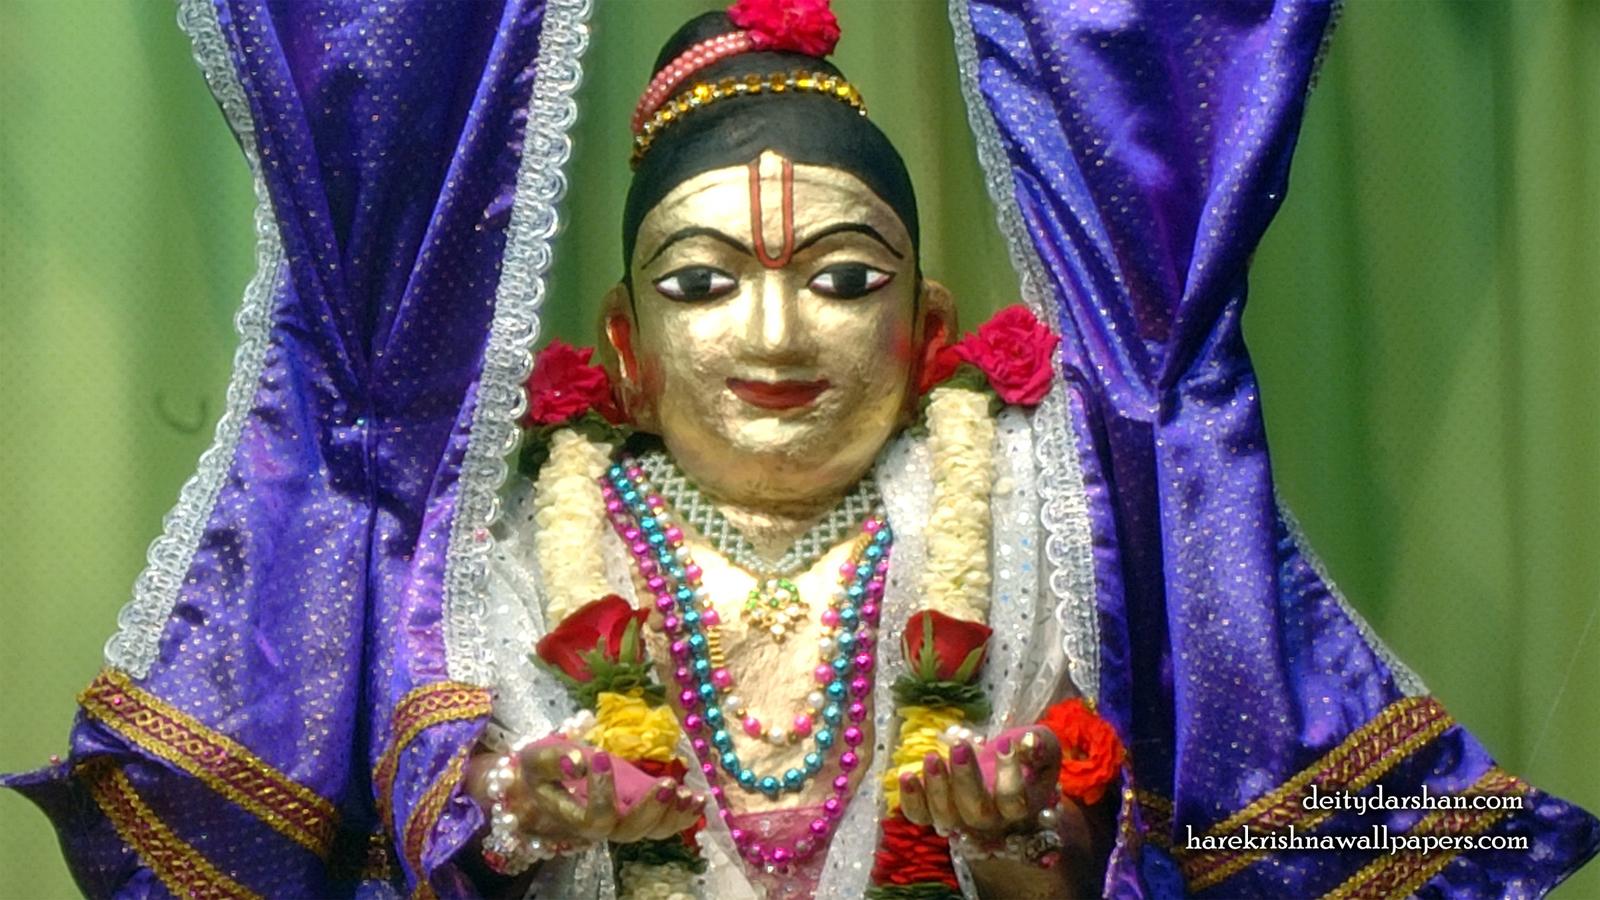 Sri Gopal Close up Wallpaper (042) Size 1600x900 Download